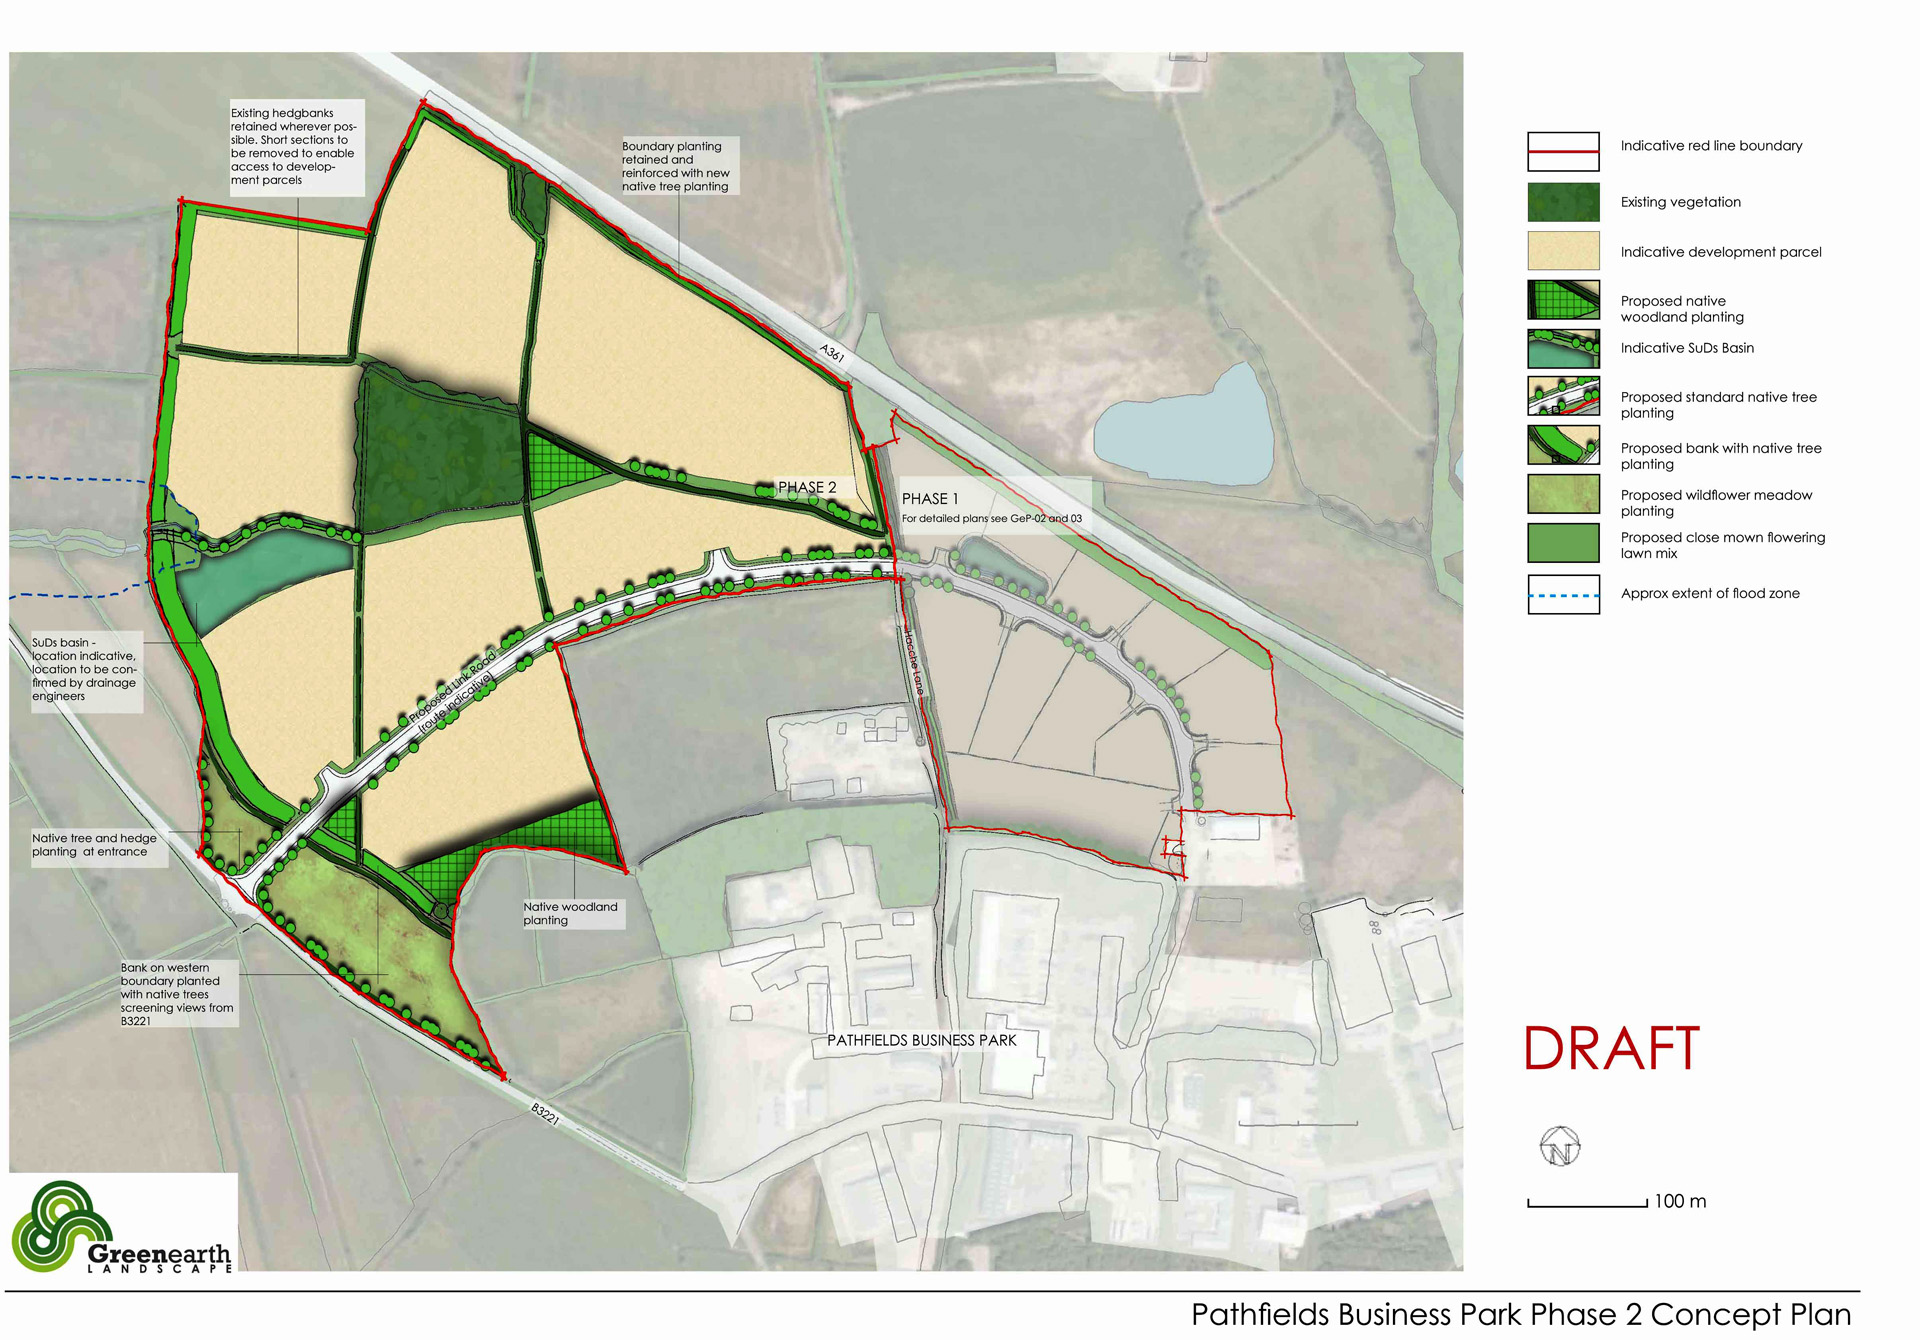 Pathfields-Concept-Plan-DRAFT-red